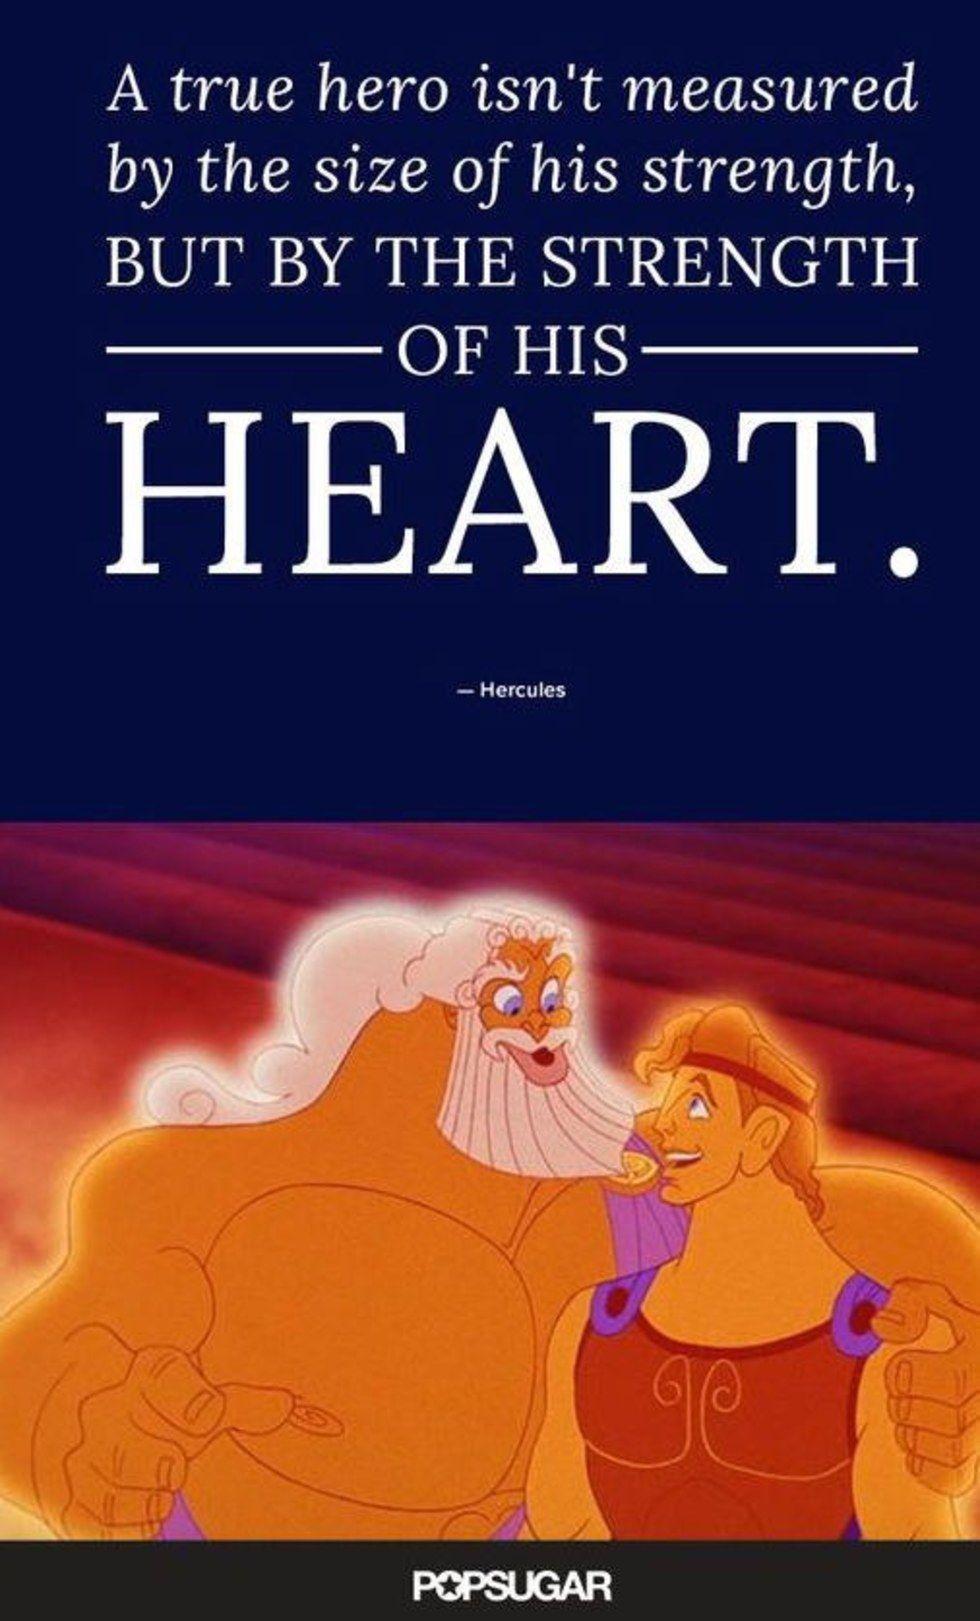 10 Inspirational Disney Movie Quotes Inspirational Quotes Disney Animation Quotes Kids Movies Quotes